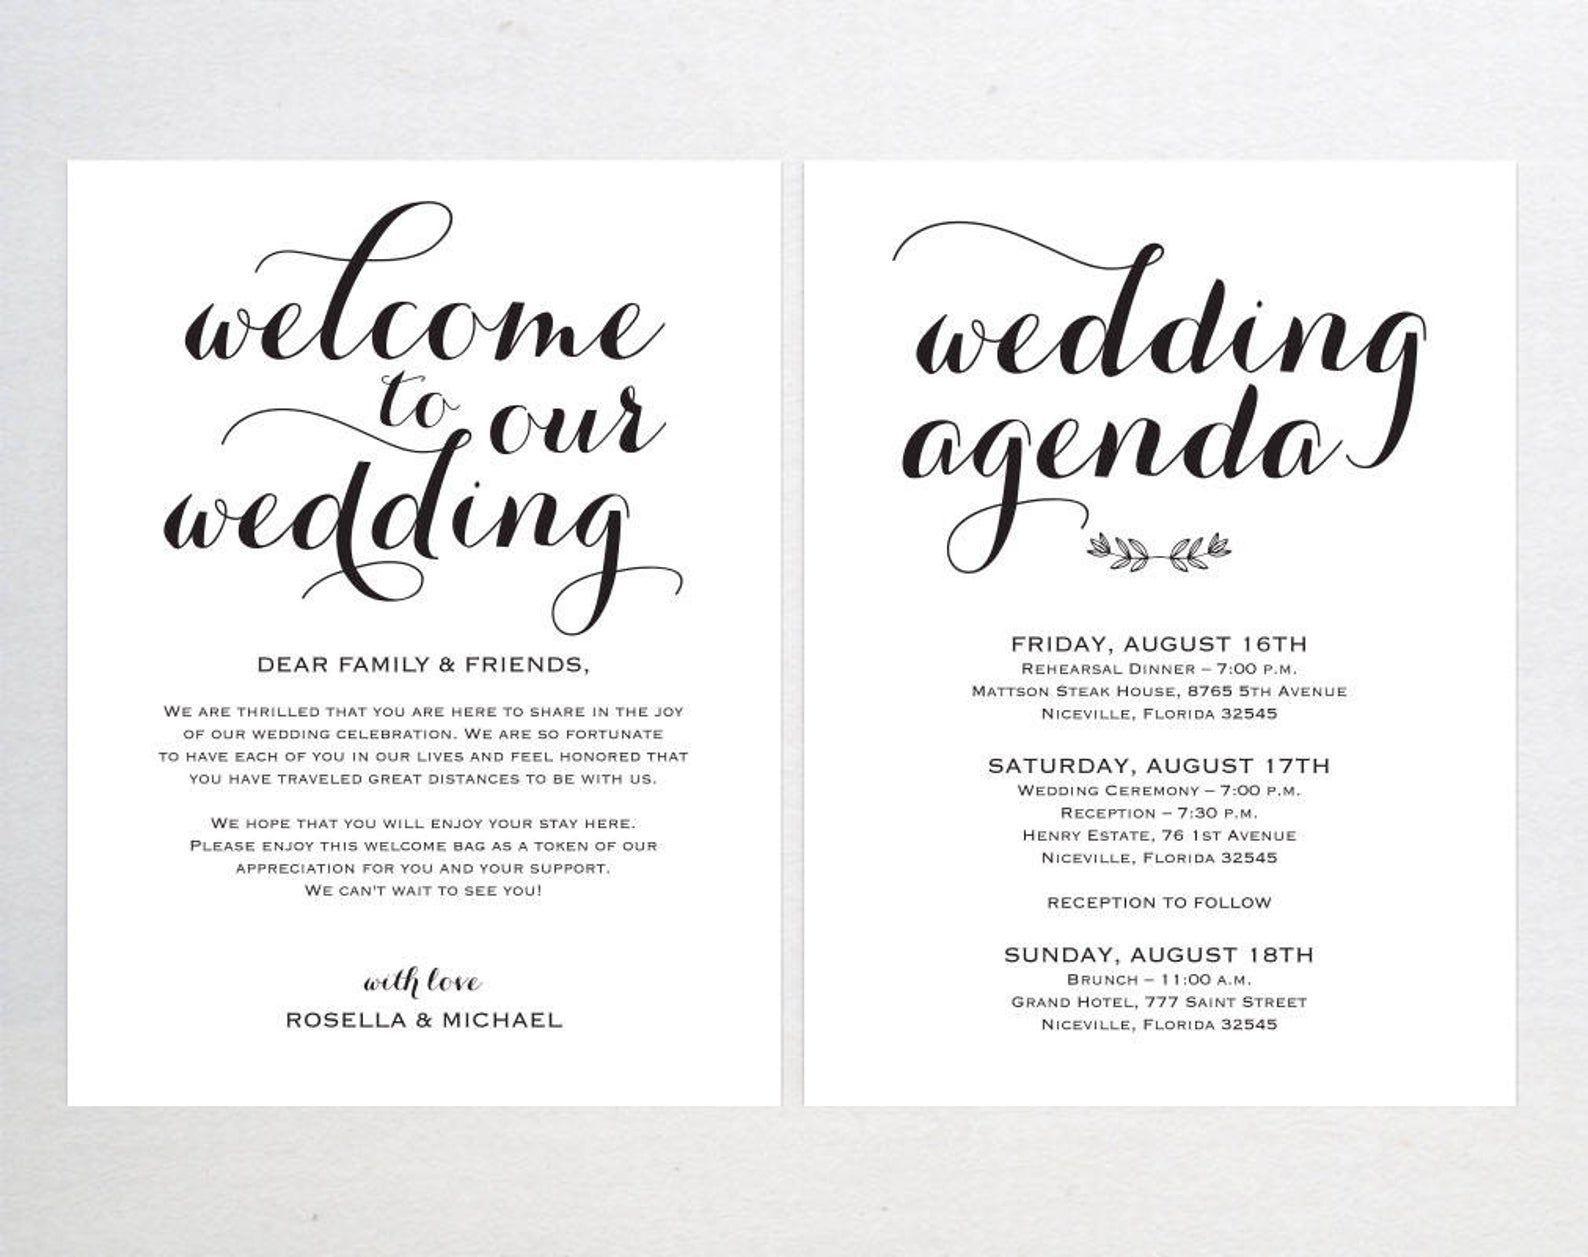 001 Sensational Wedding Welcome Bag Letter Template Free High Definition Full